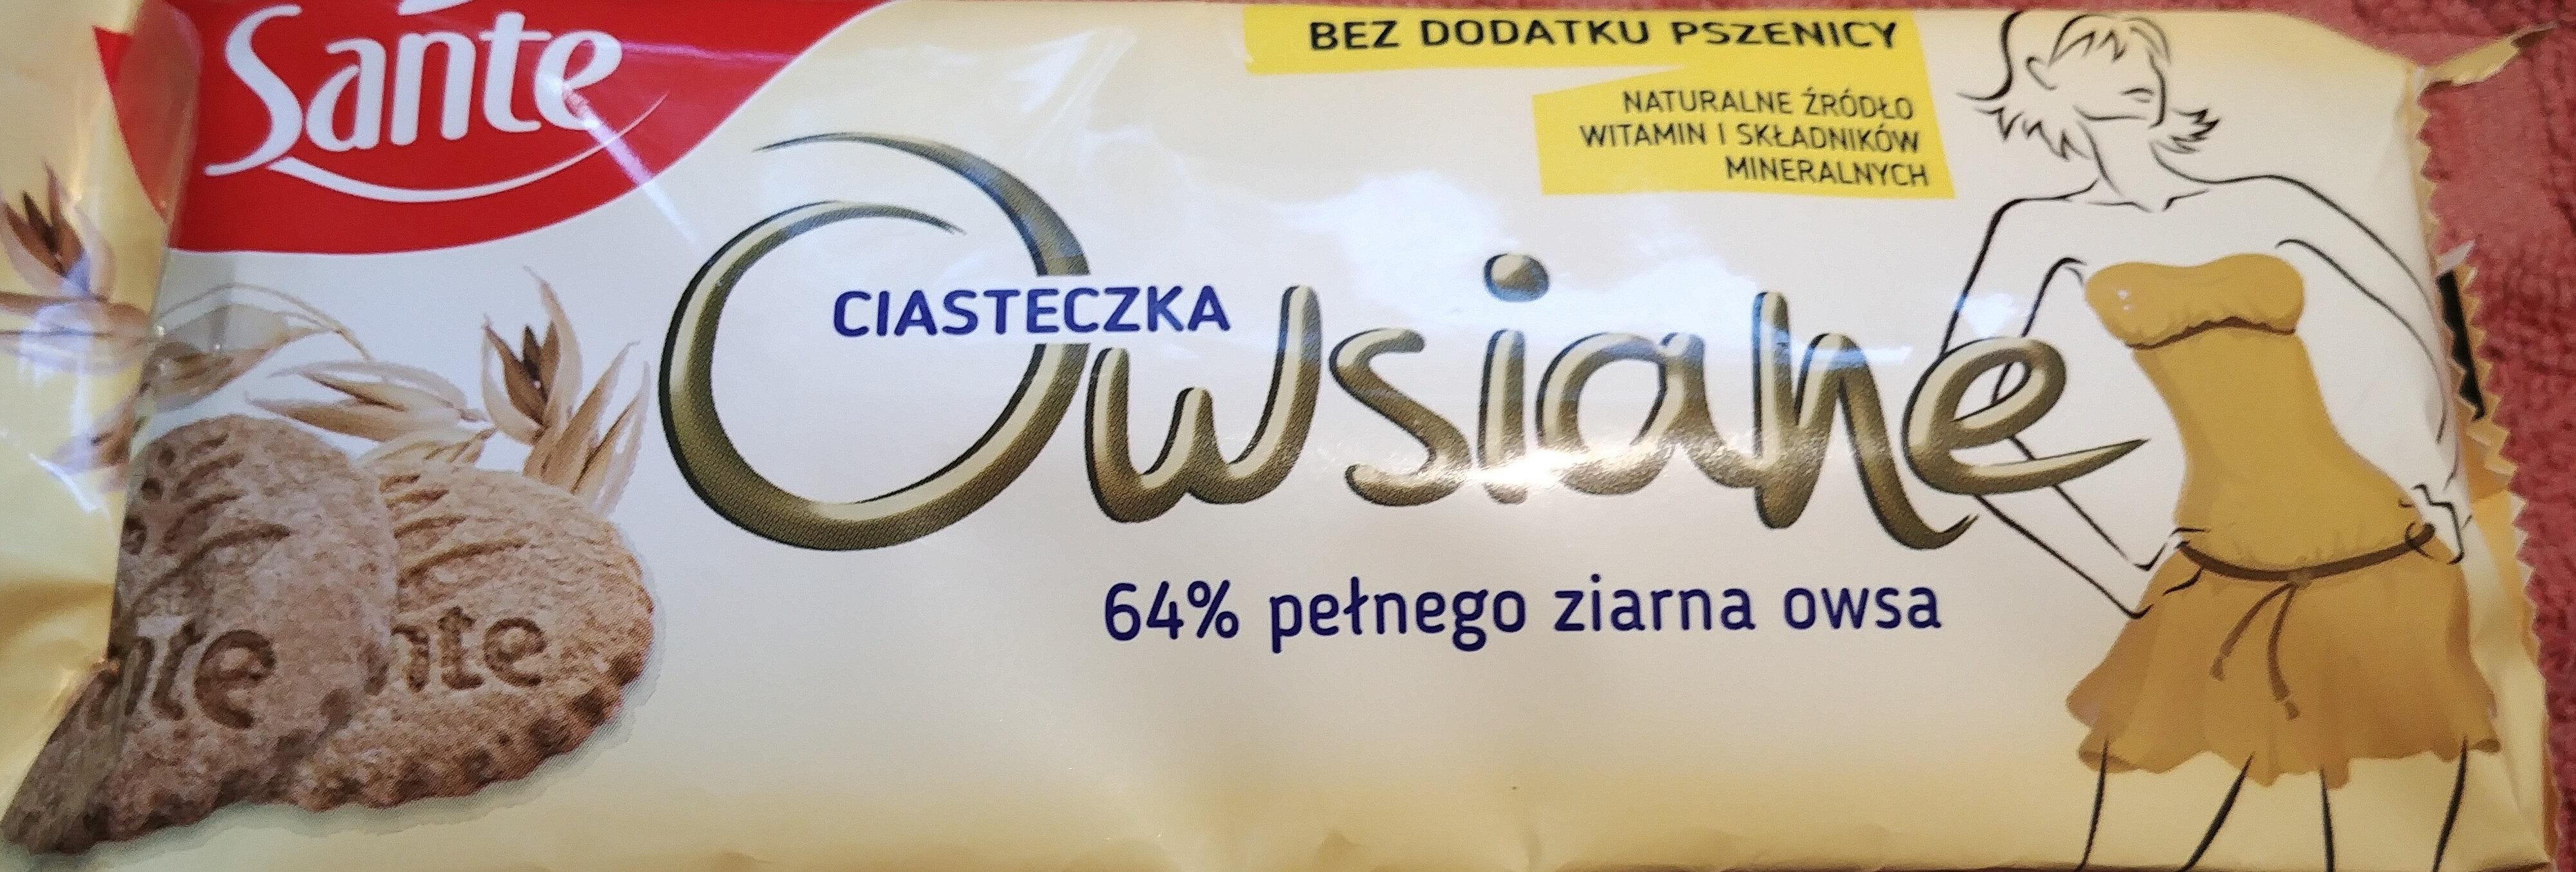 Oat cookies classic - Produkt - pl